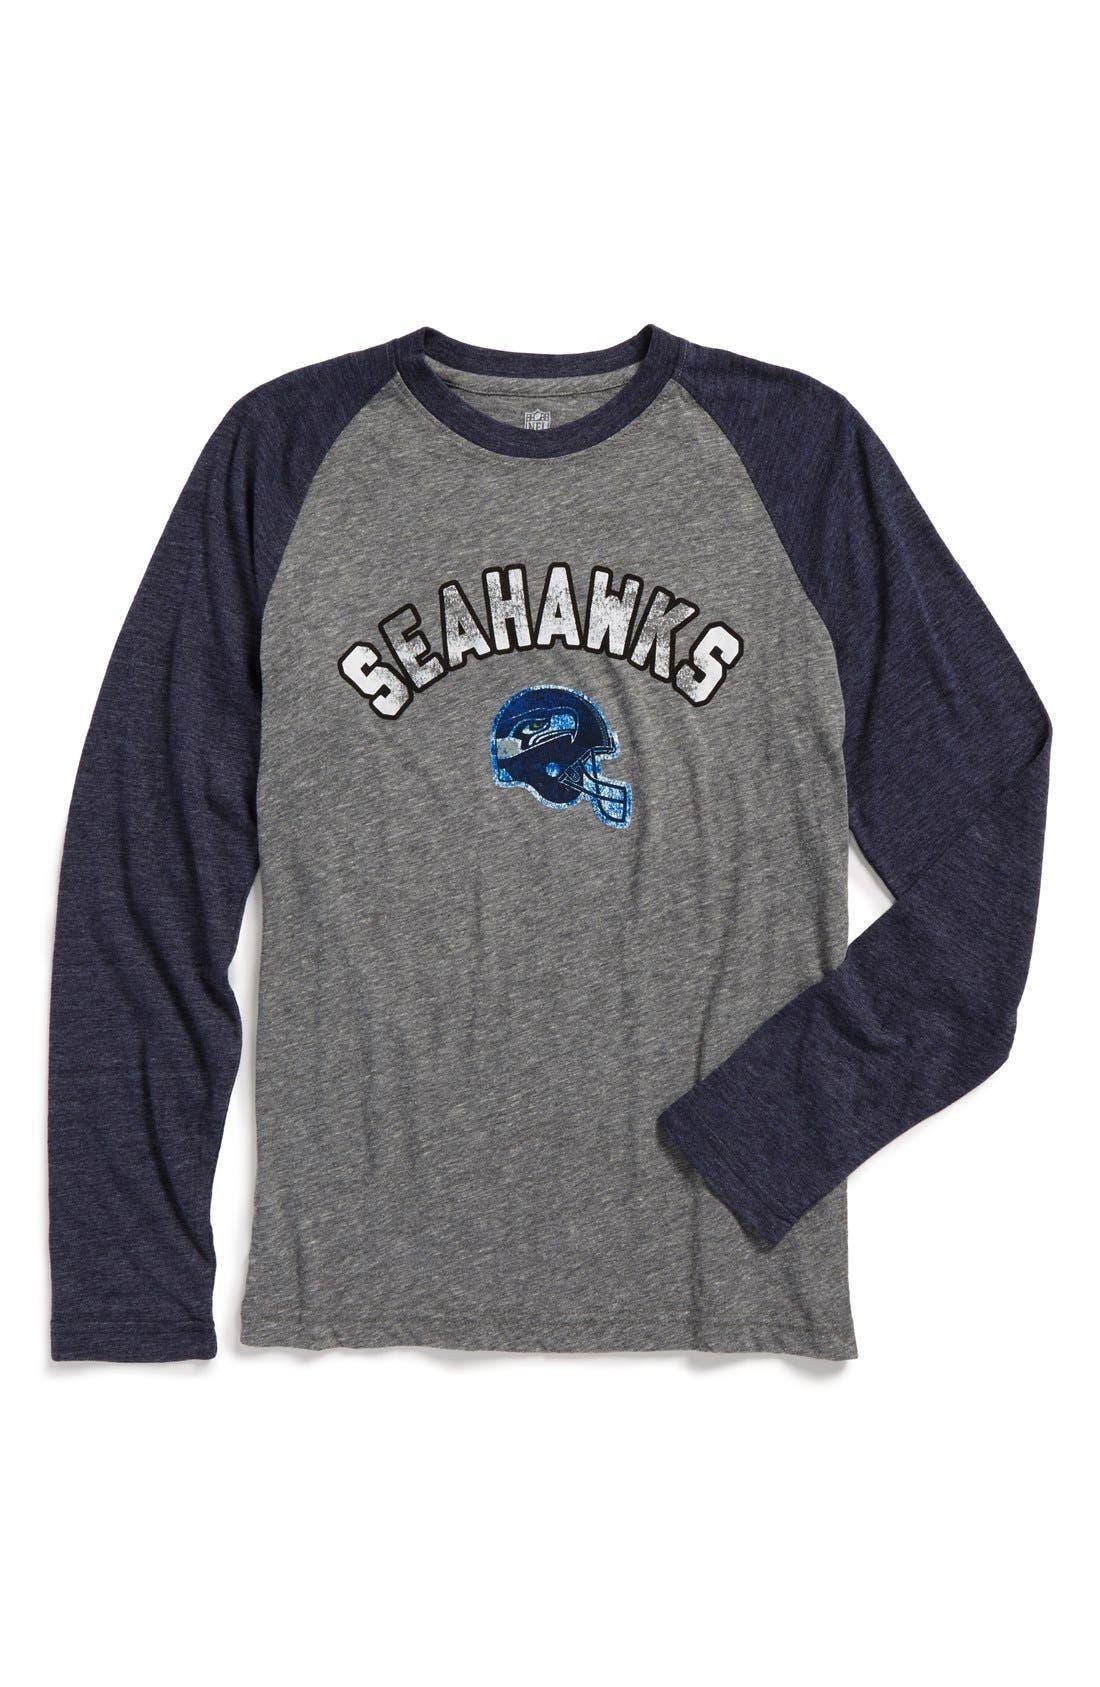 Alternate Image 1 Selected - Outerstuff 'NFL - Seattle Seahawks' Raglan Sleeve Graphic T-Shirt (Big Boys)